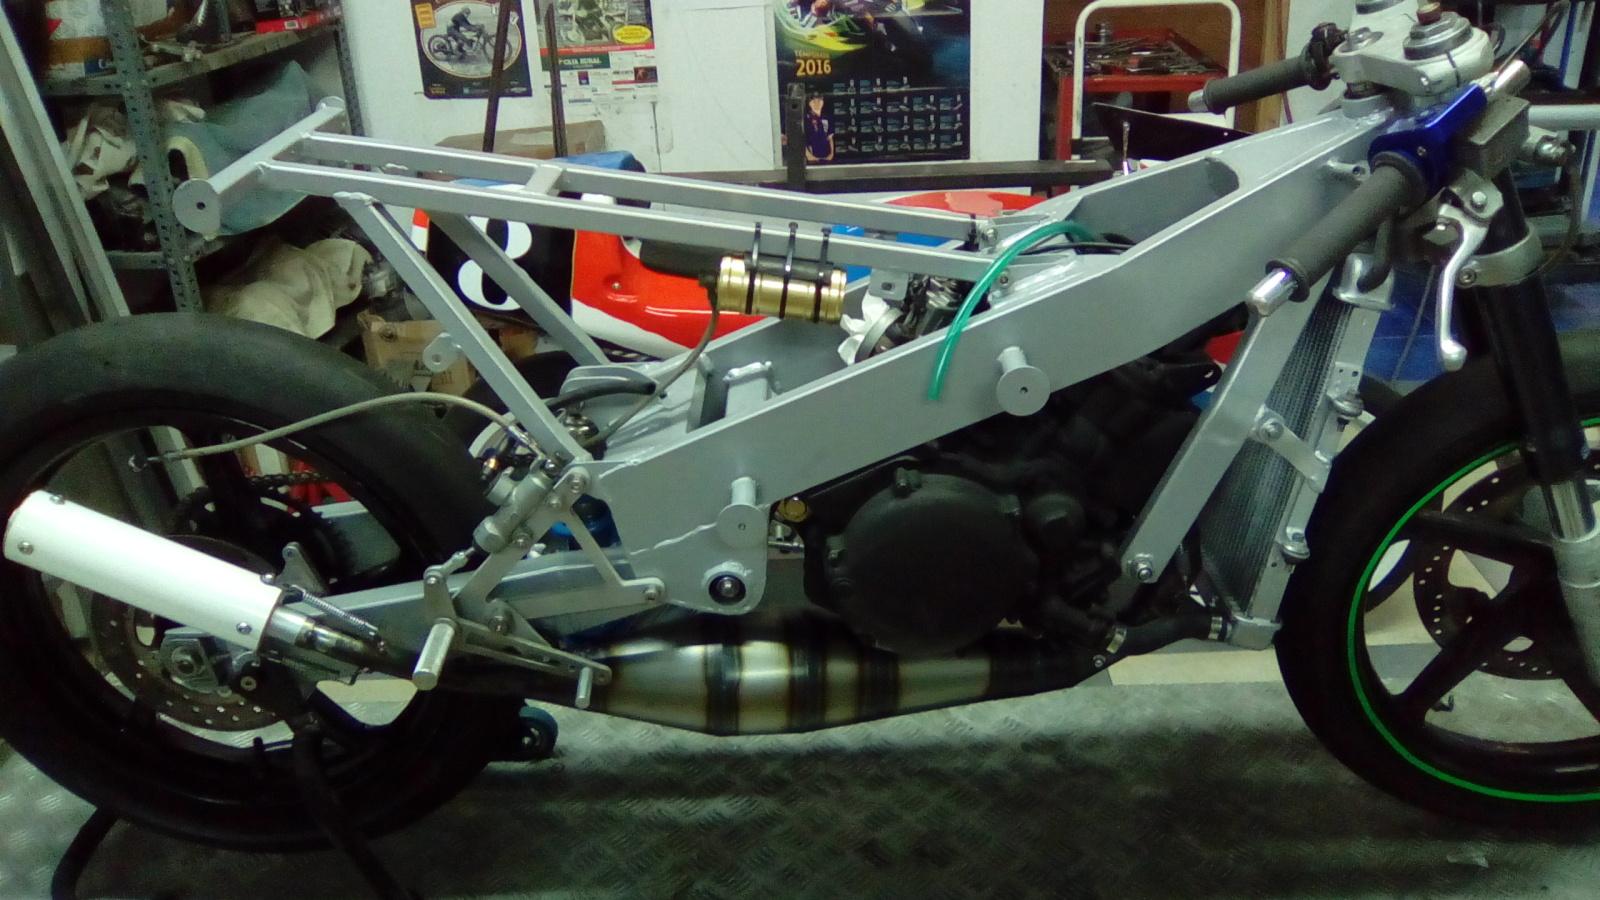 MH 003 JJ.COBAS Moto Hernan Wrdrib